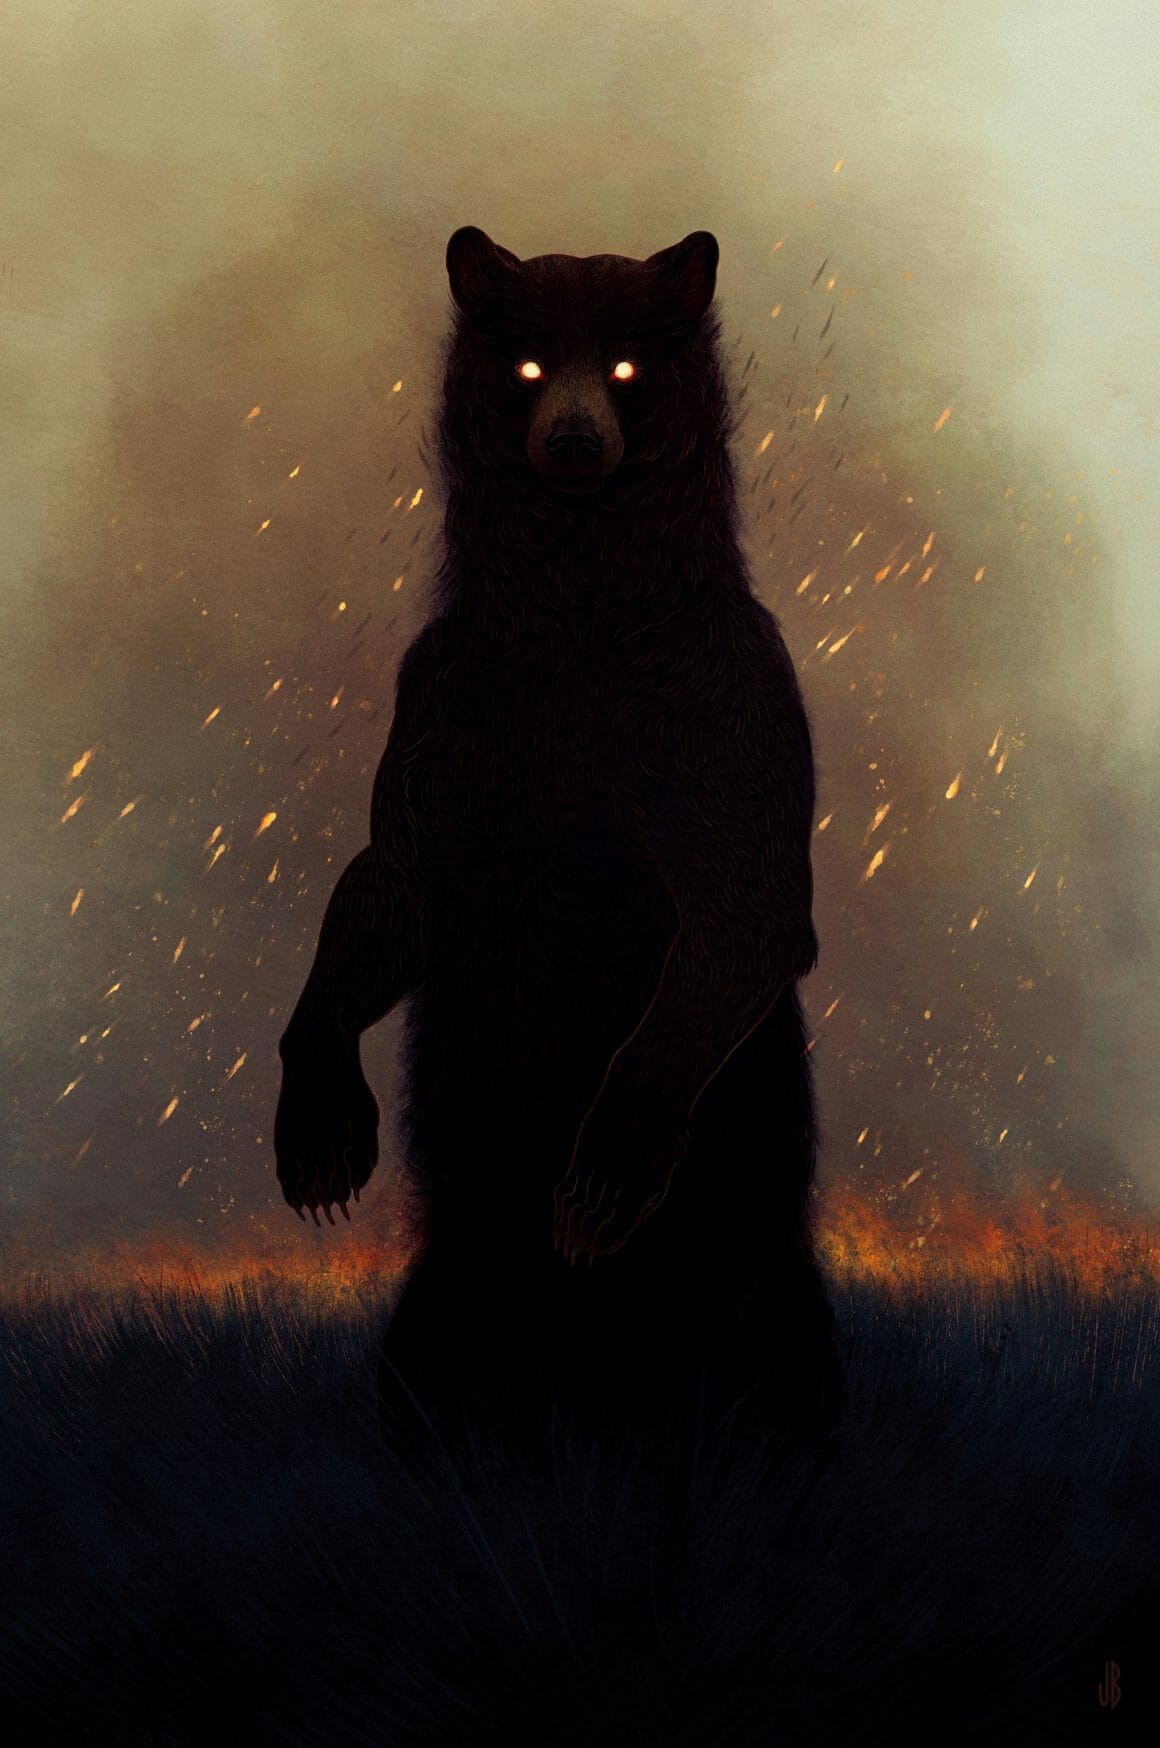 dessin d'ours